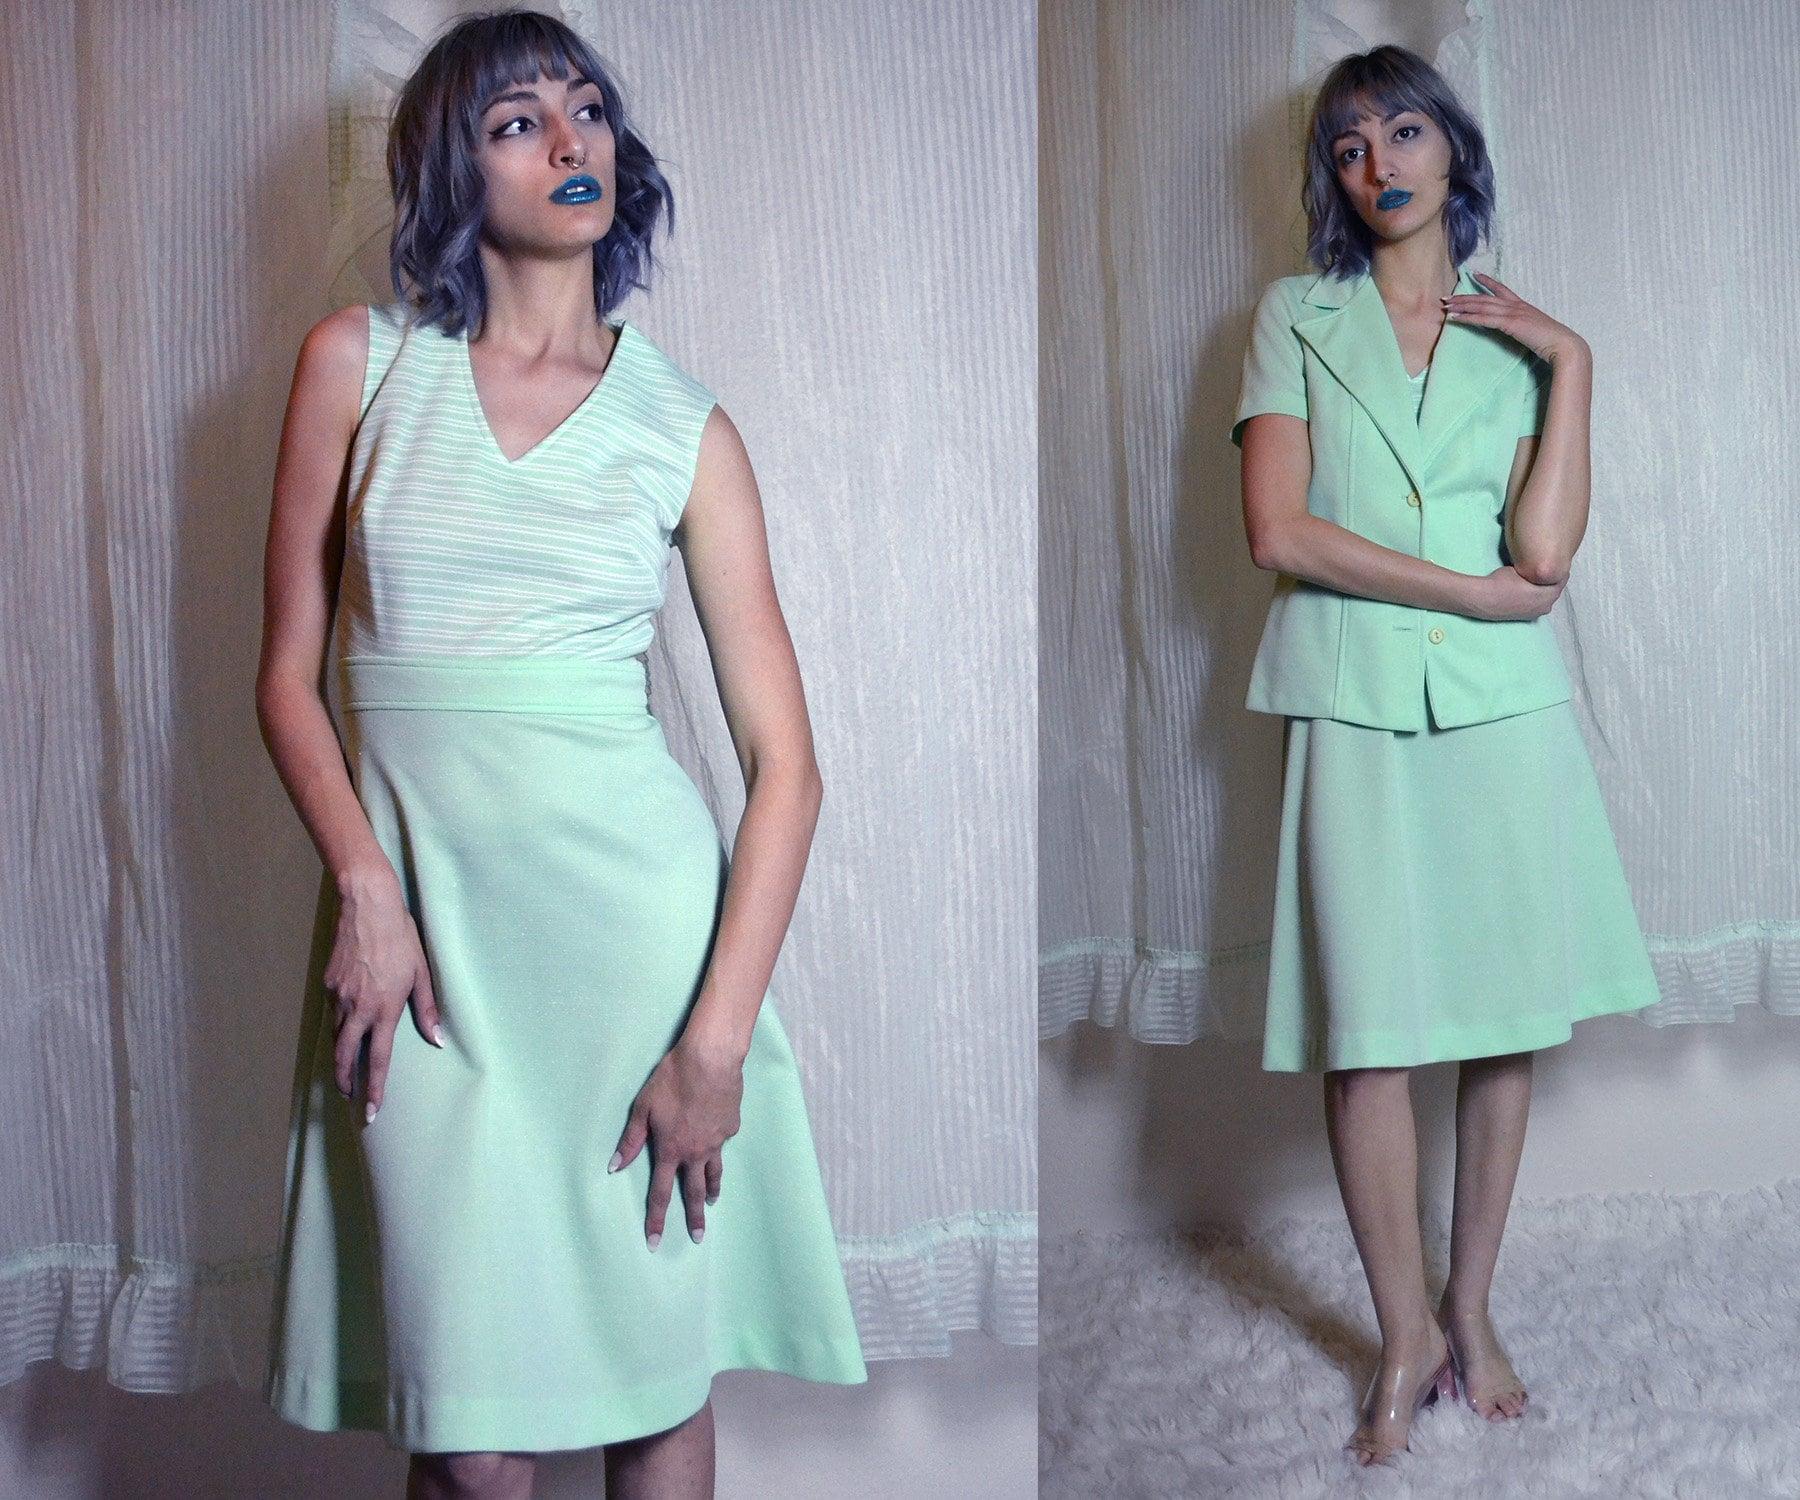 bc367857101 60s mod sleeveless striped mint green A line dress with matching short  sleeve bolero jacket